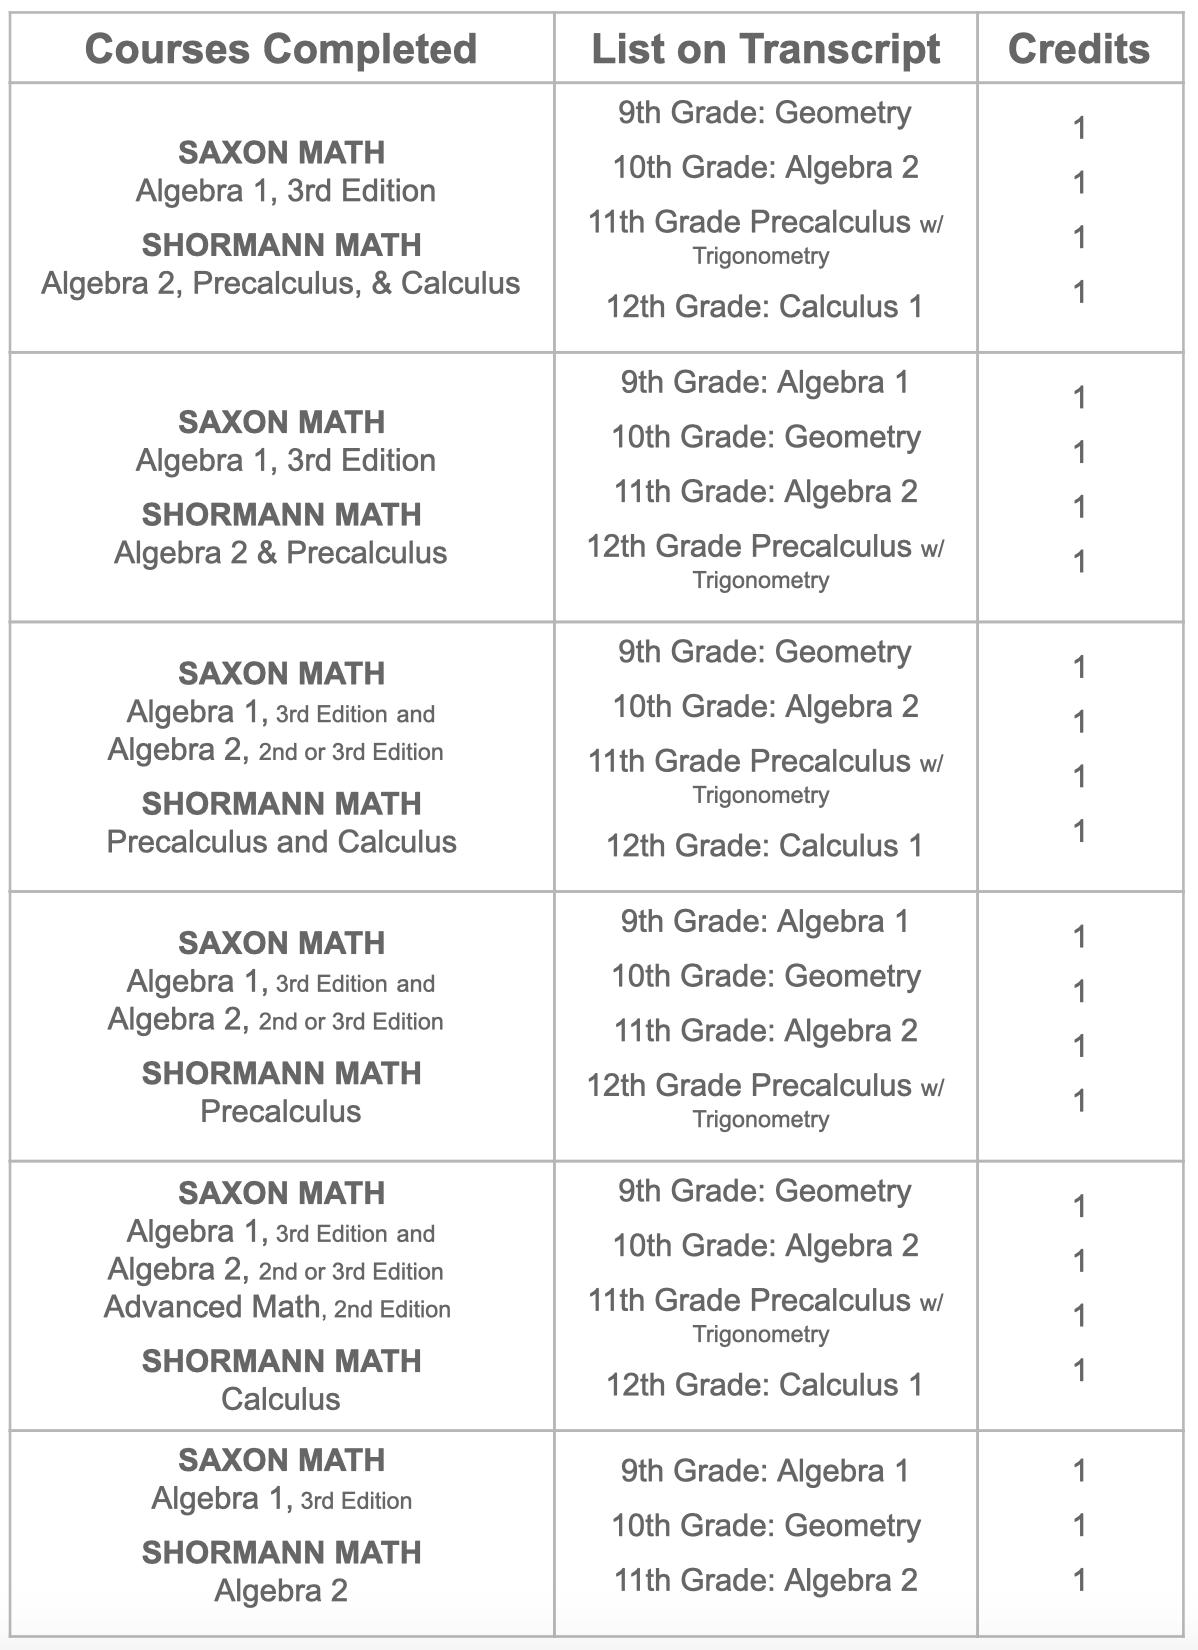 credits-standard-saxon-shormann-math.png